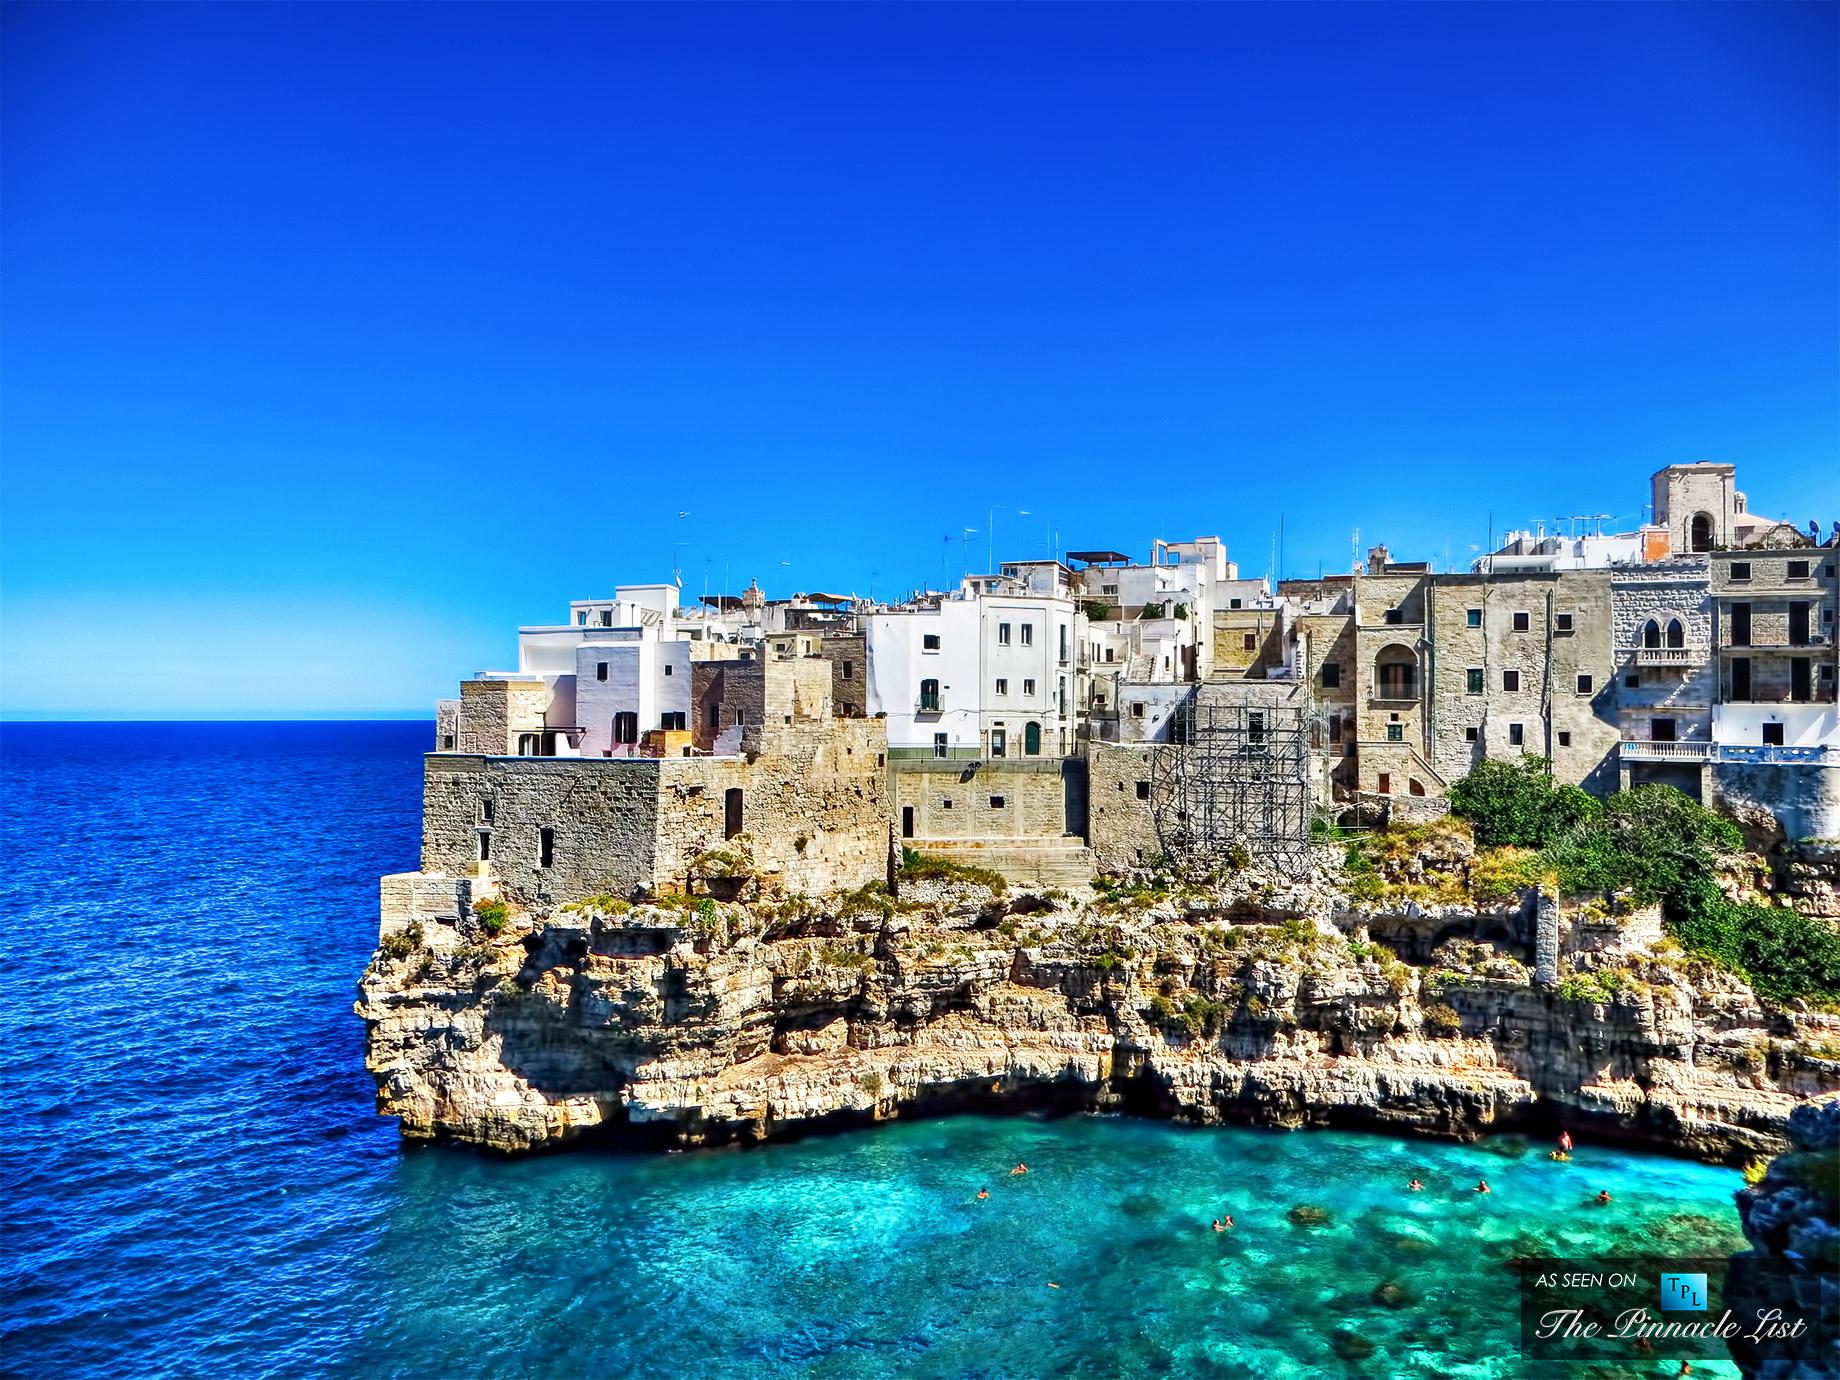 Bandiere blu, ecco le 11 città premiate in Puglia in provincia di Bari grande delusione per una città